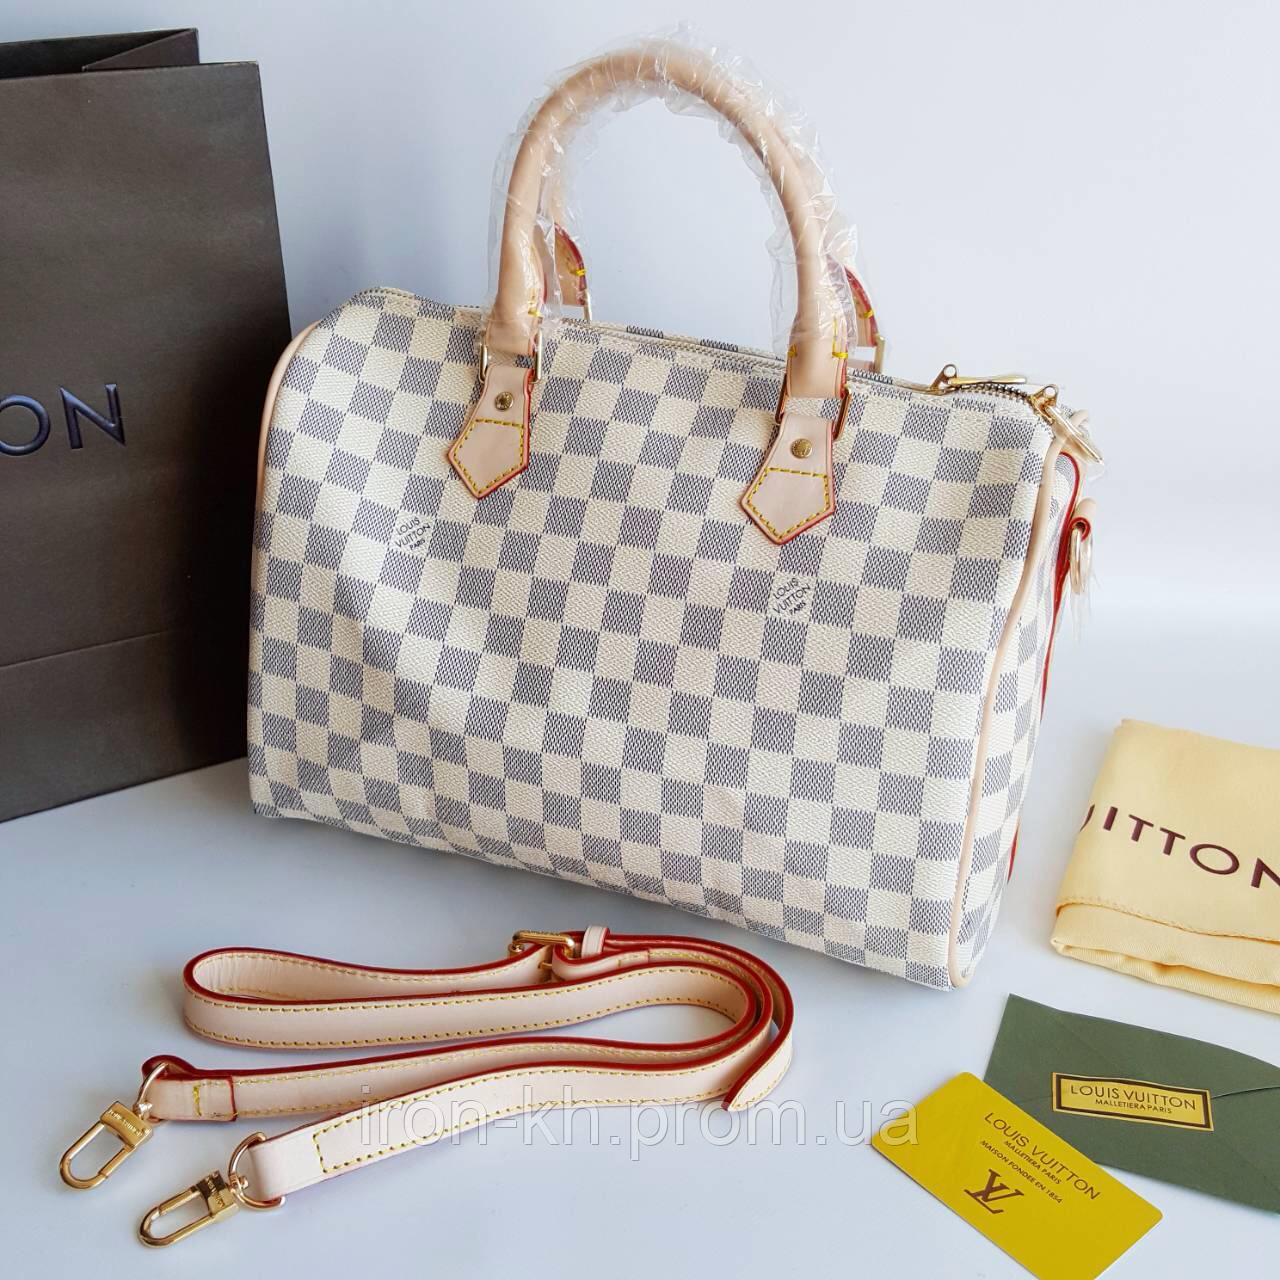 0252203e5e15 Женская сумка LOUIS VUITTON: продажа, цена в Харькове. женские ...